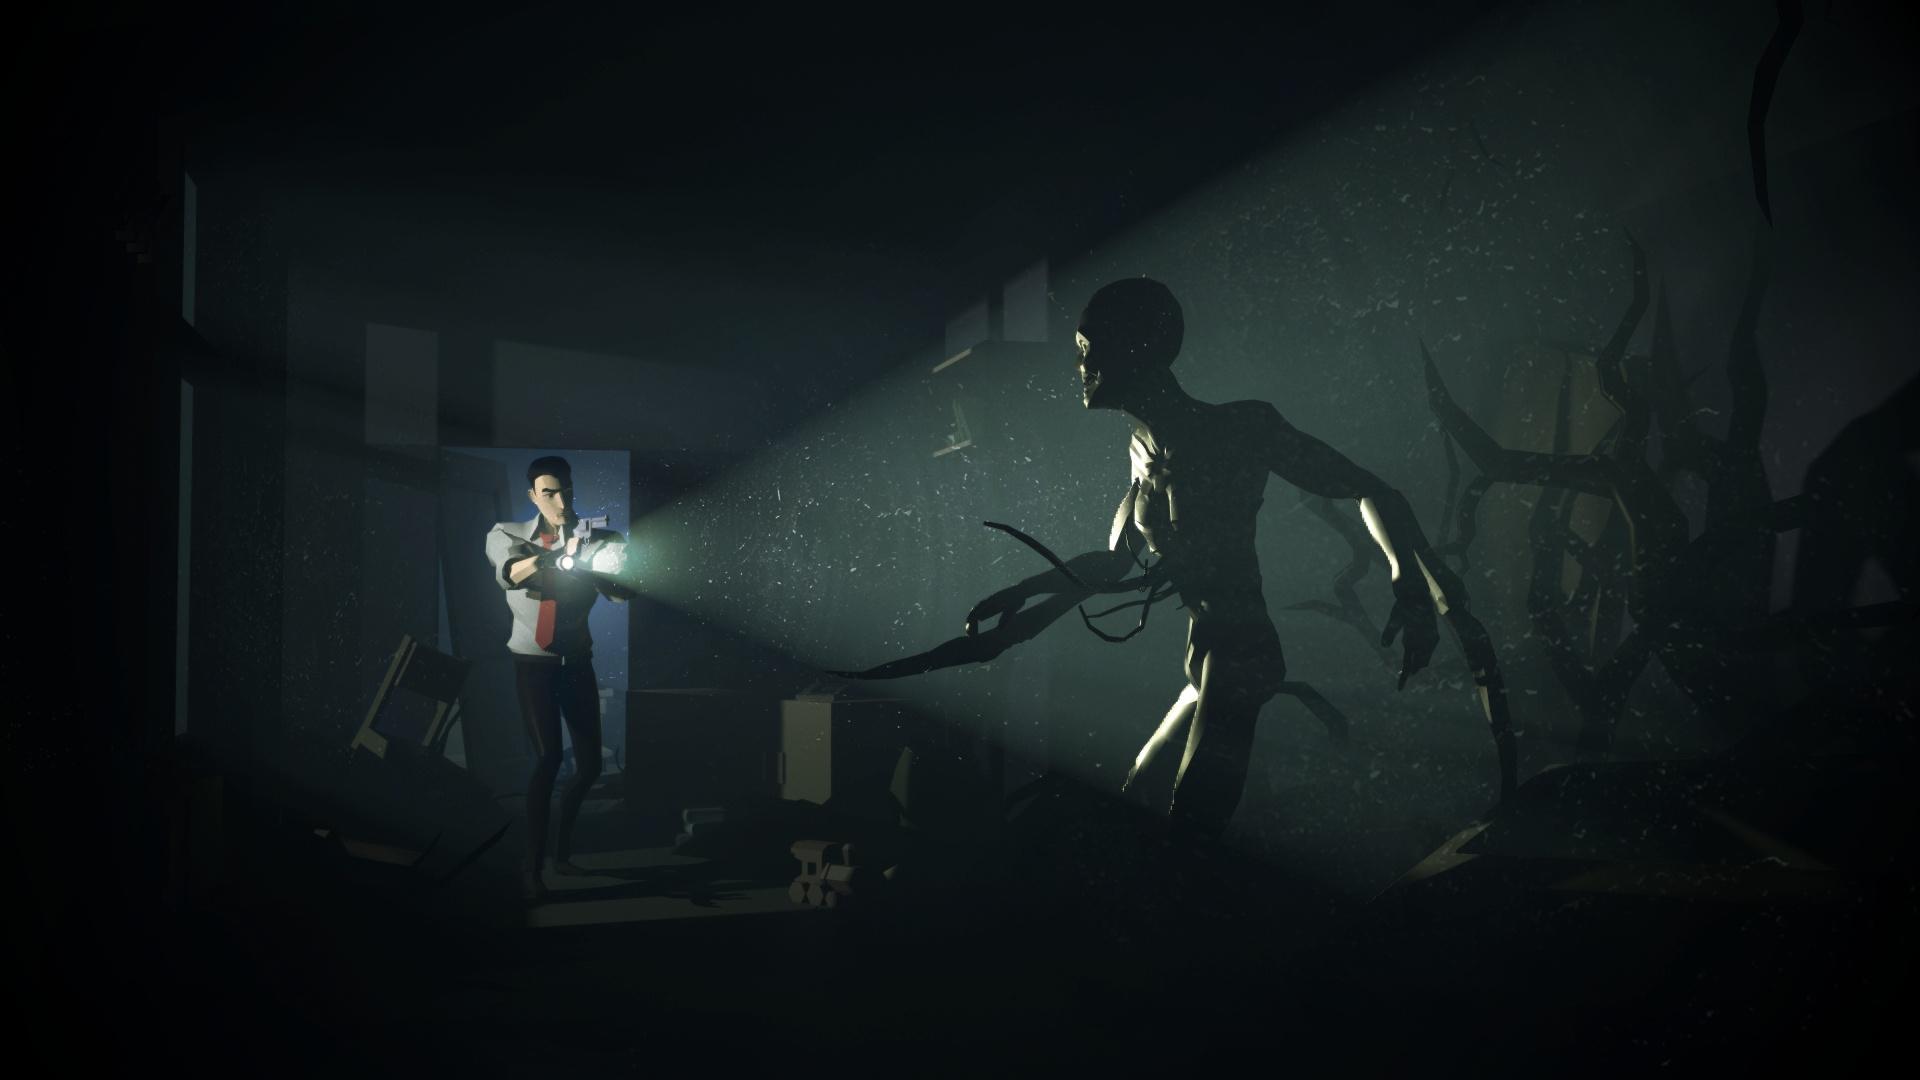 Превью Skyhill: Black Mist. Хоррор-выживалка в духе Resident Evil ...